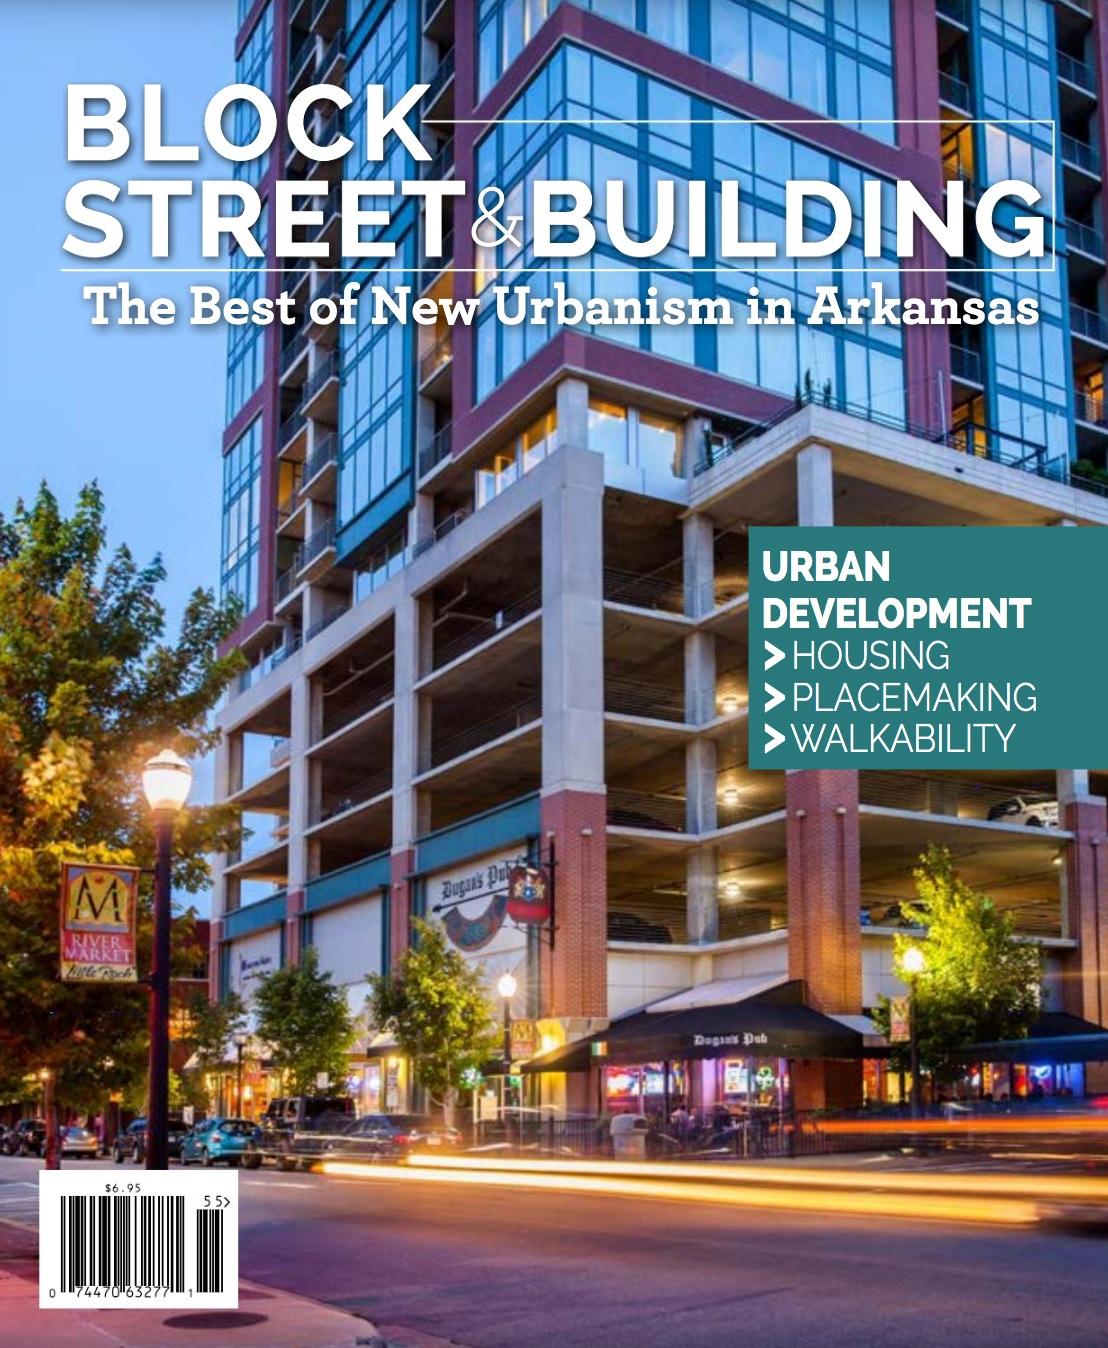 Block Street & Building 2015